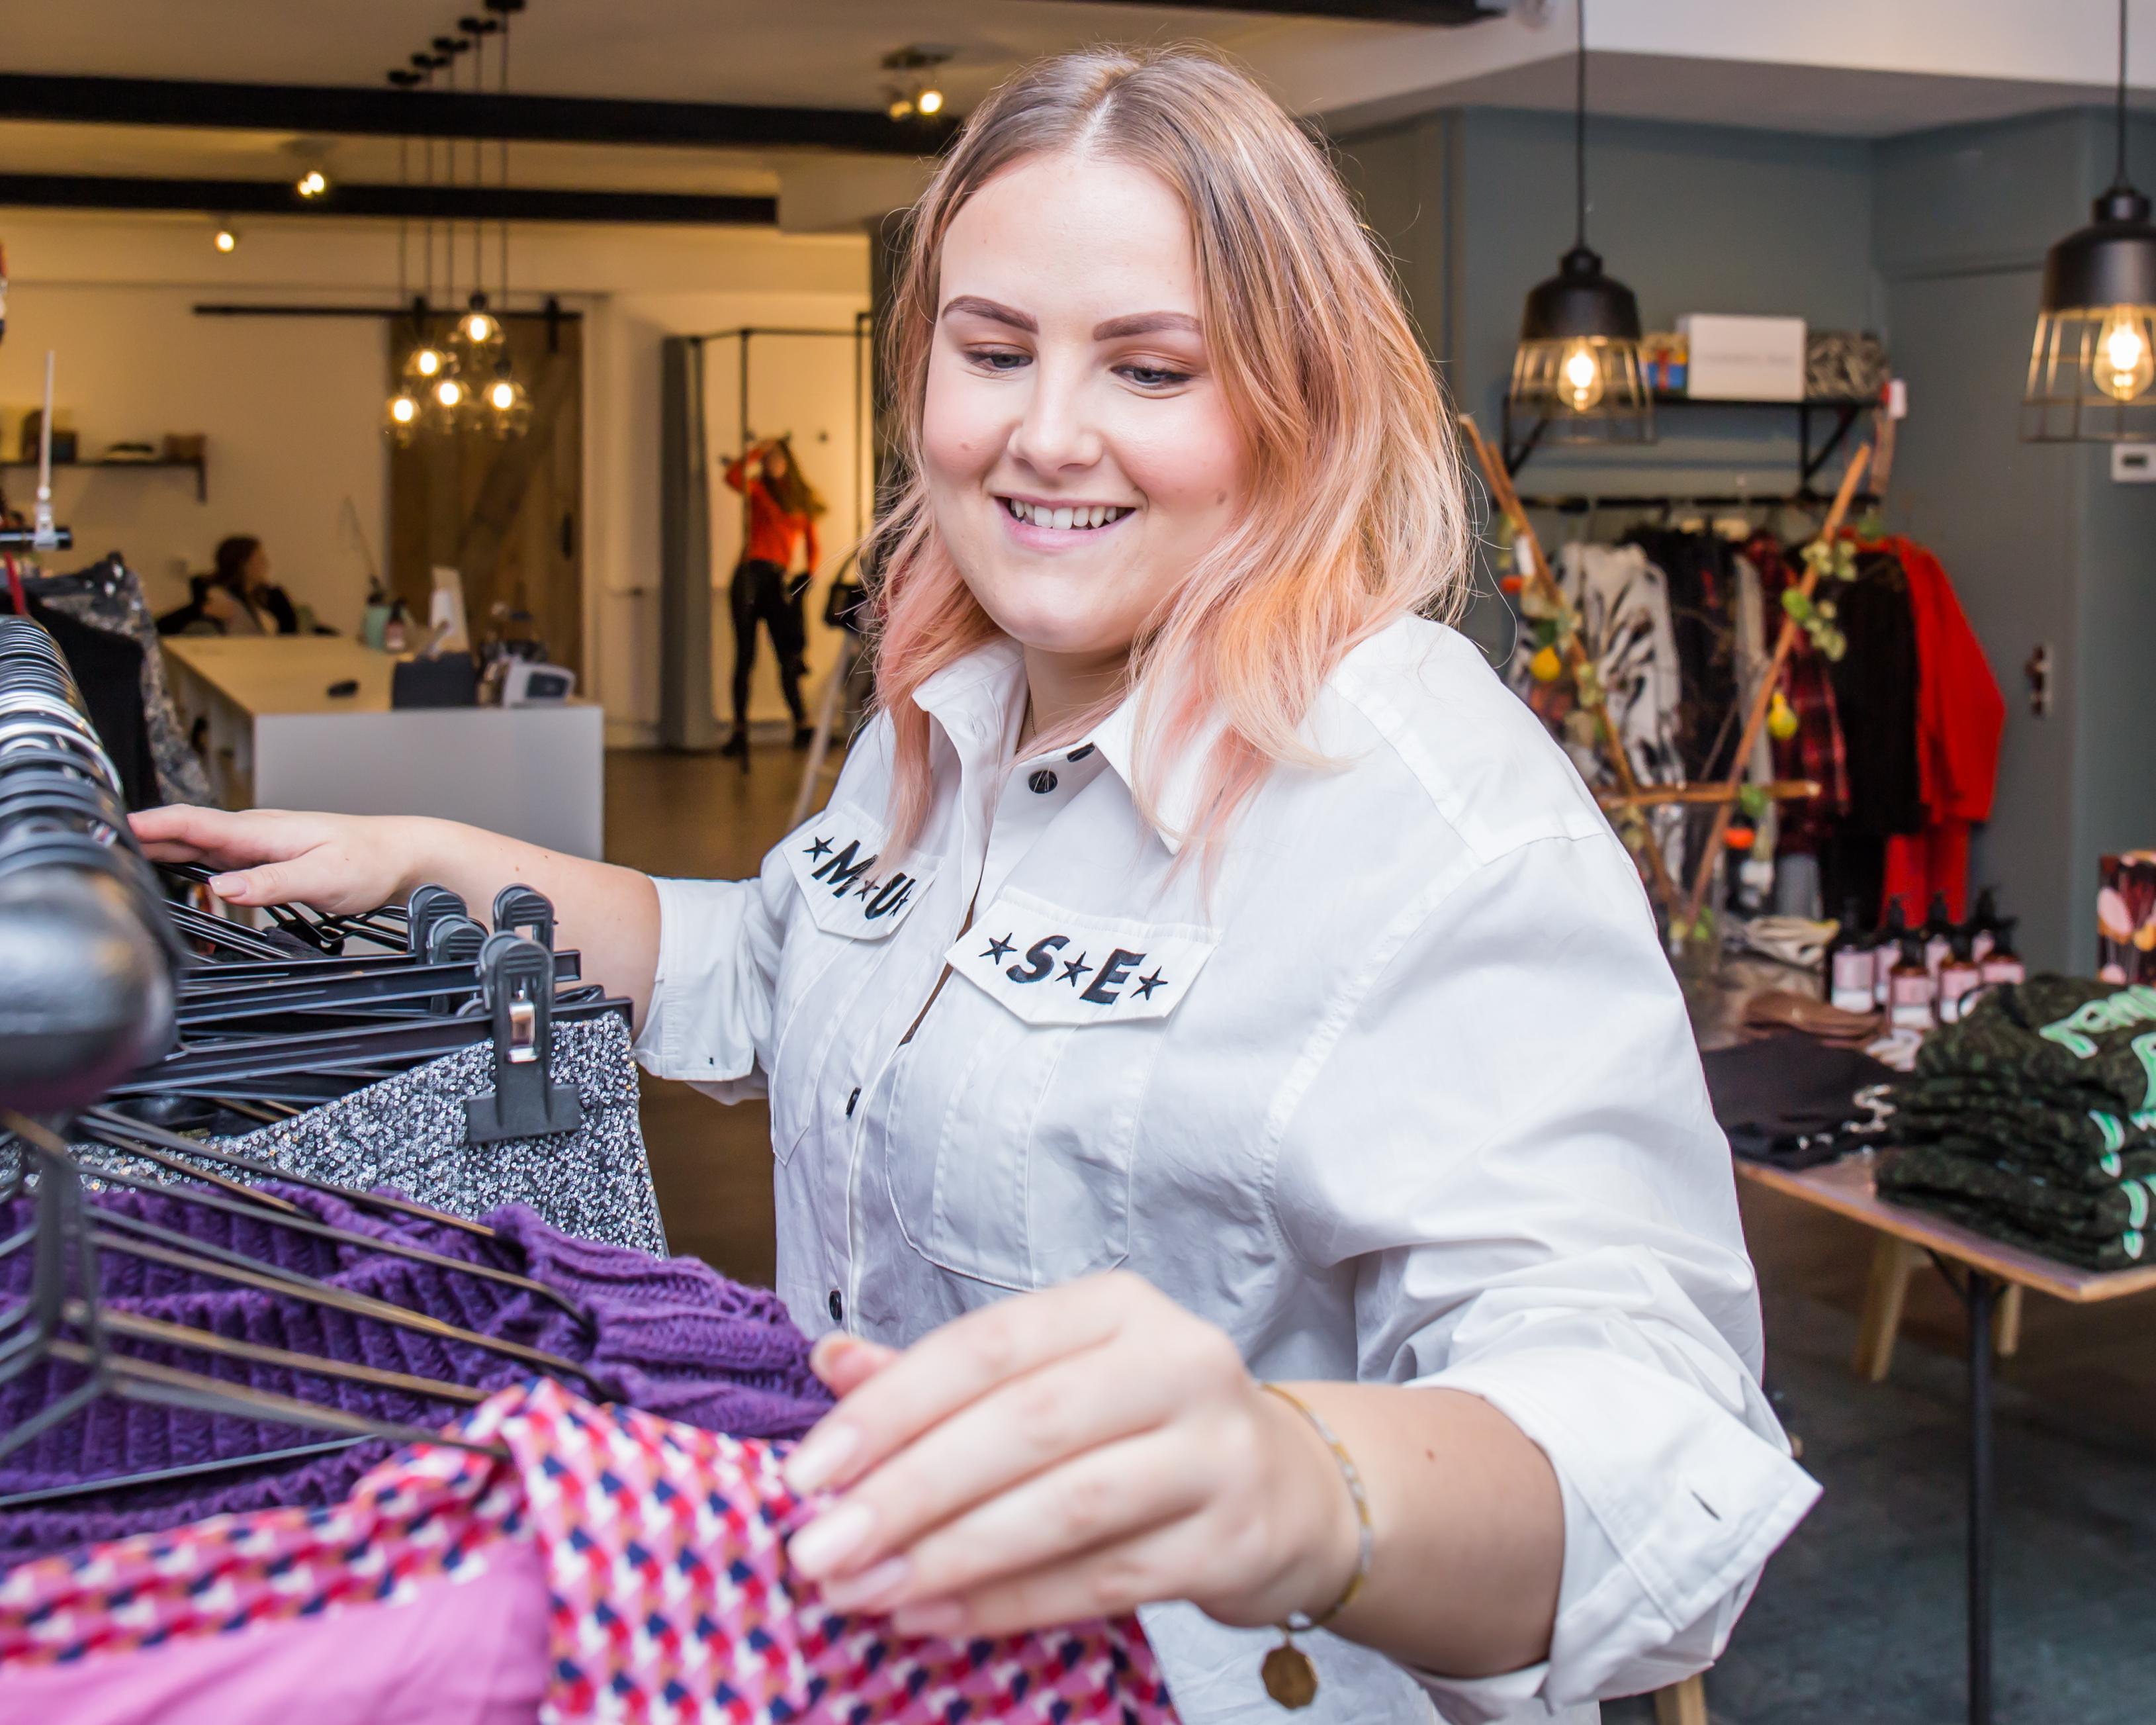 Demi Hogelucht (23) – DEEM, the new boutique